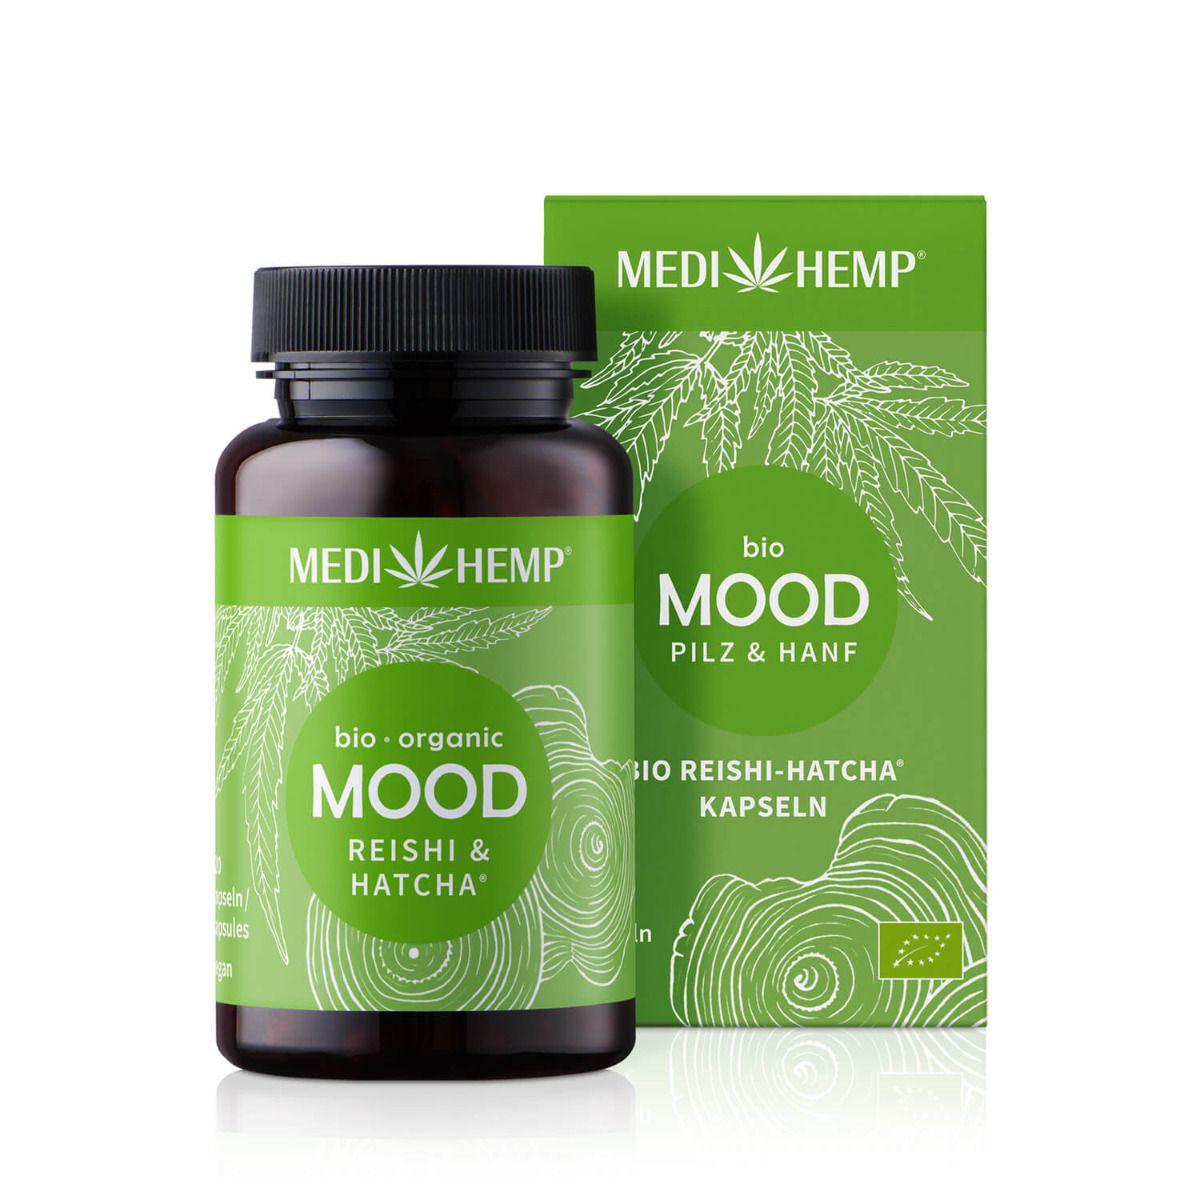 Bio MOOD Reishi-HATCHA®, 120 Kapseln, vegan